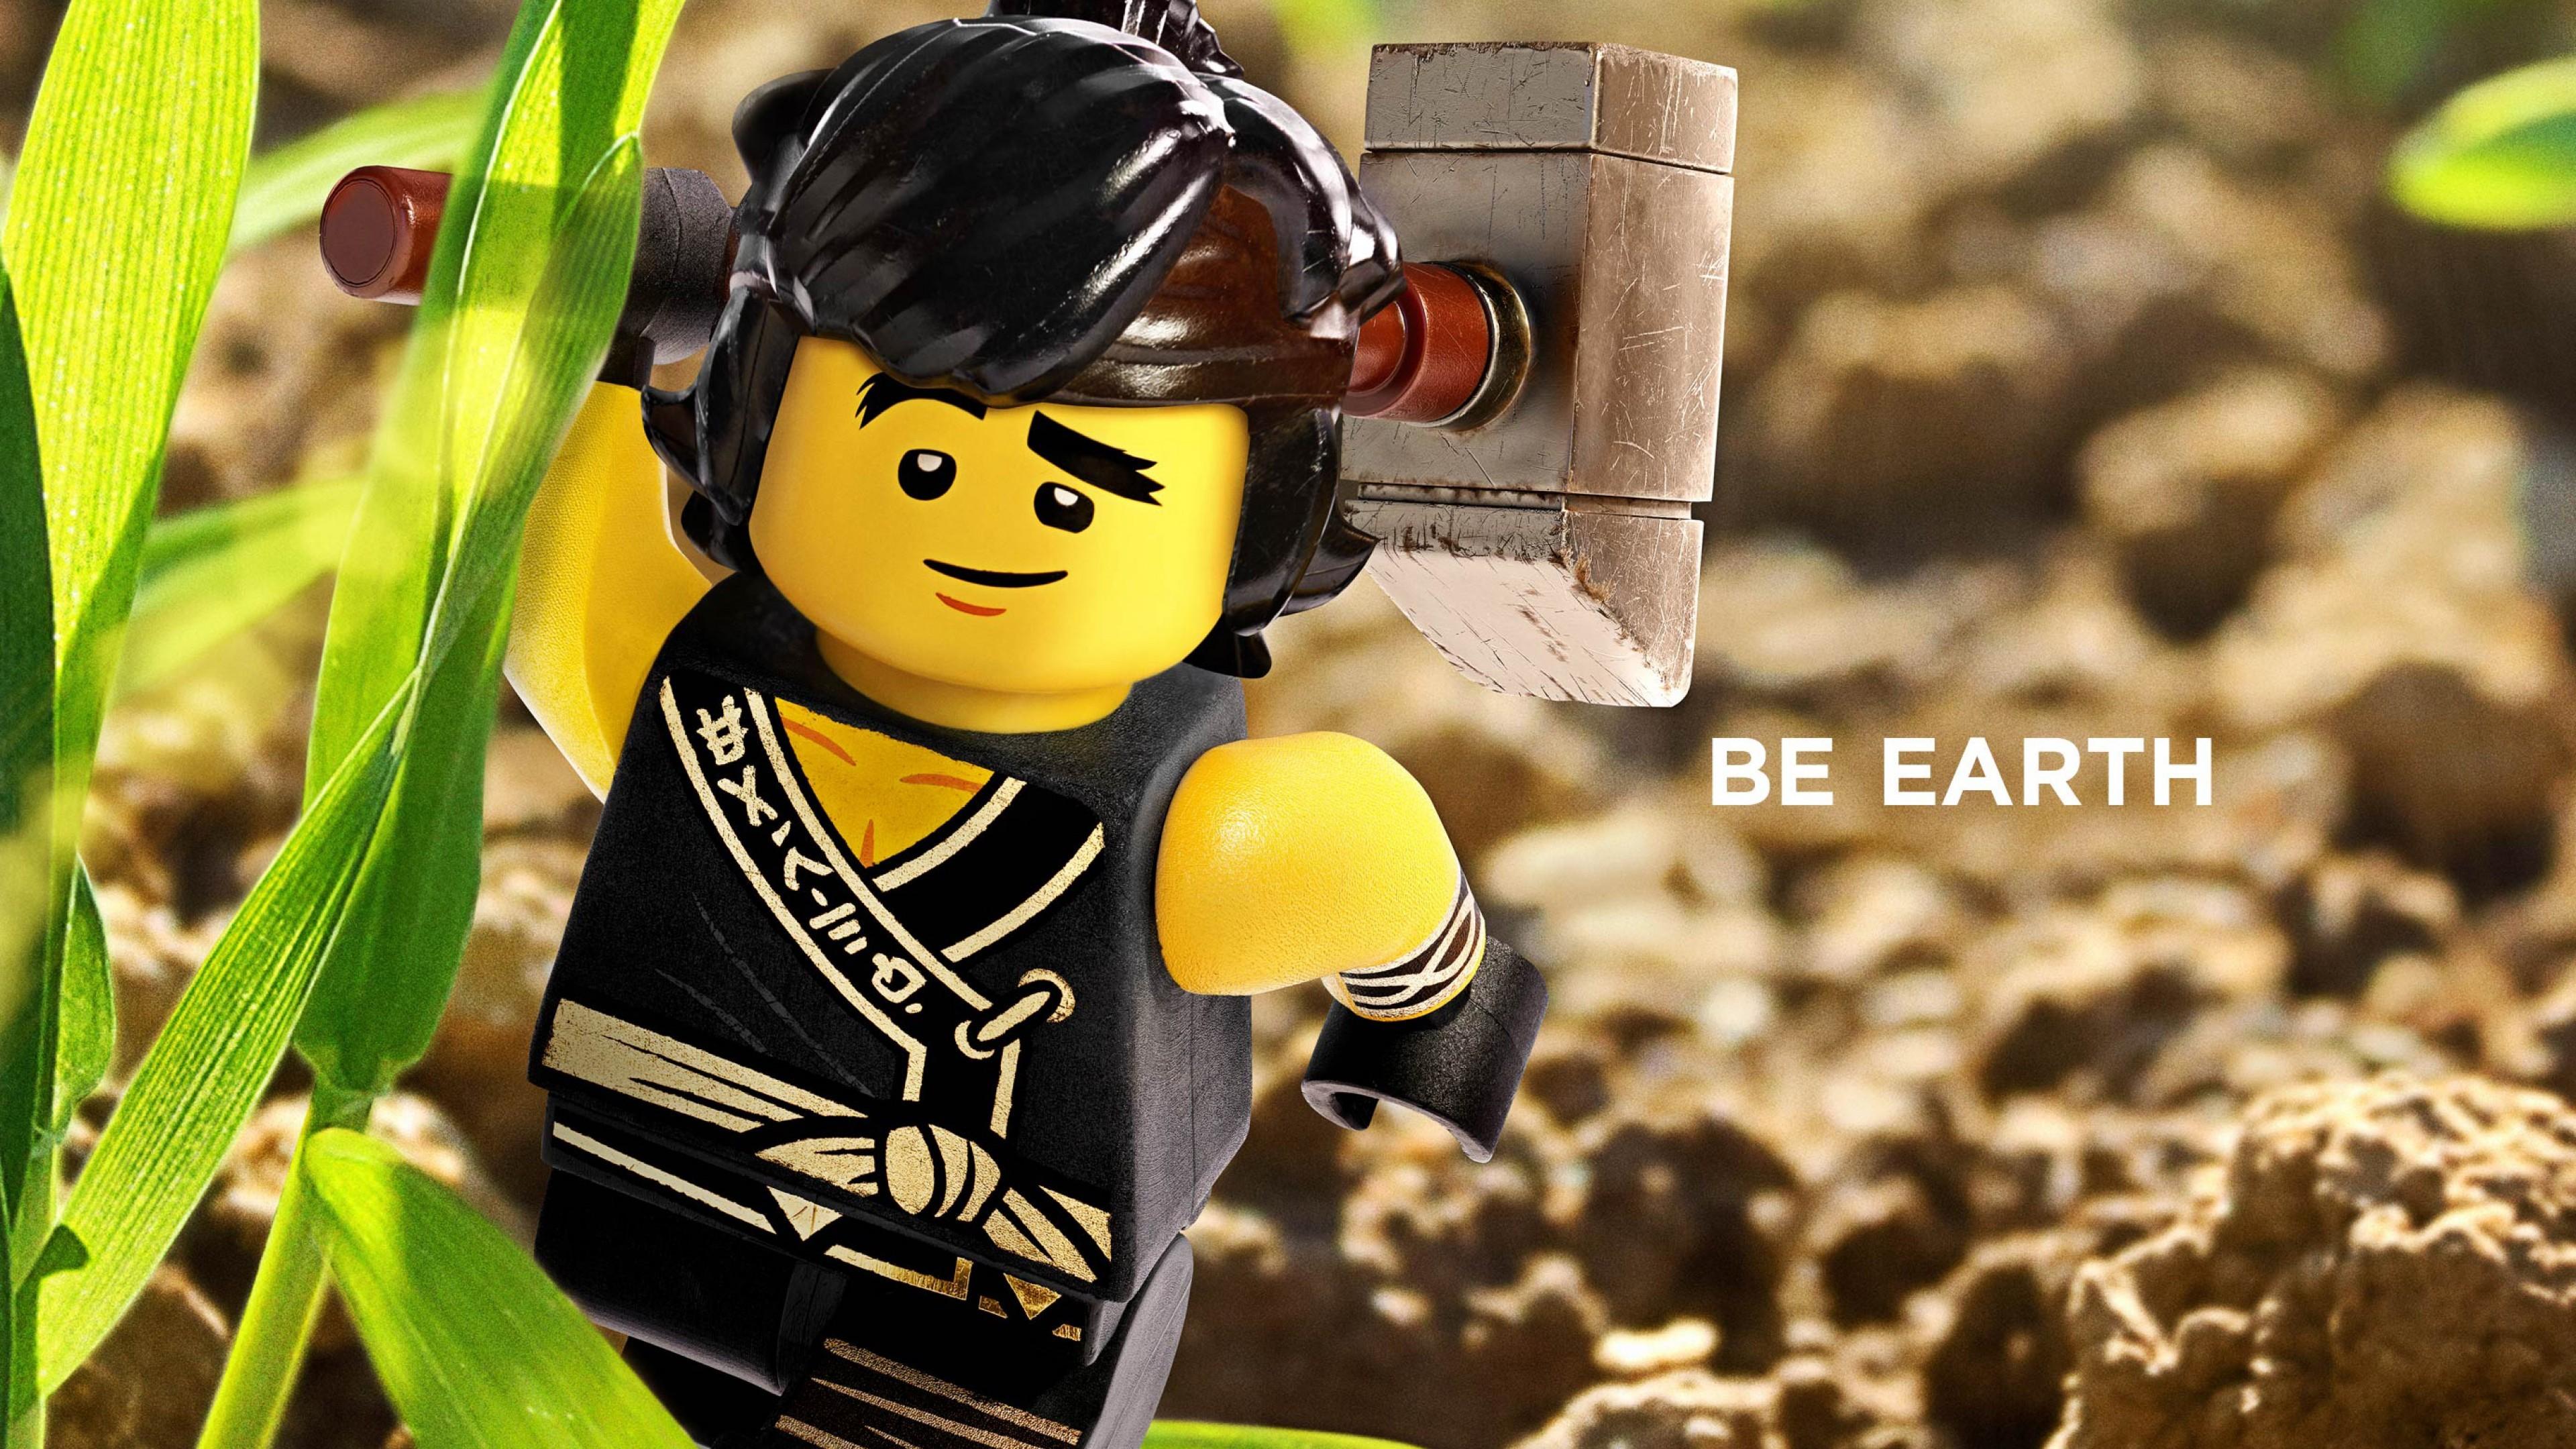 Tags: Cole, The Lego Ninjago …